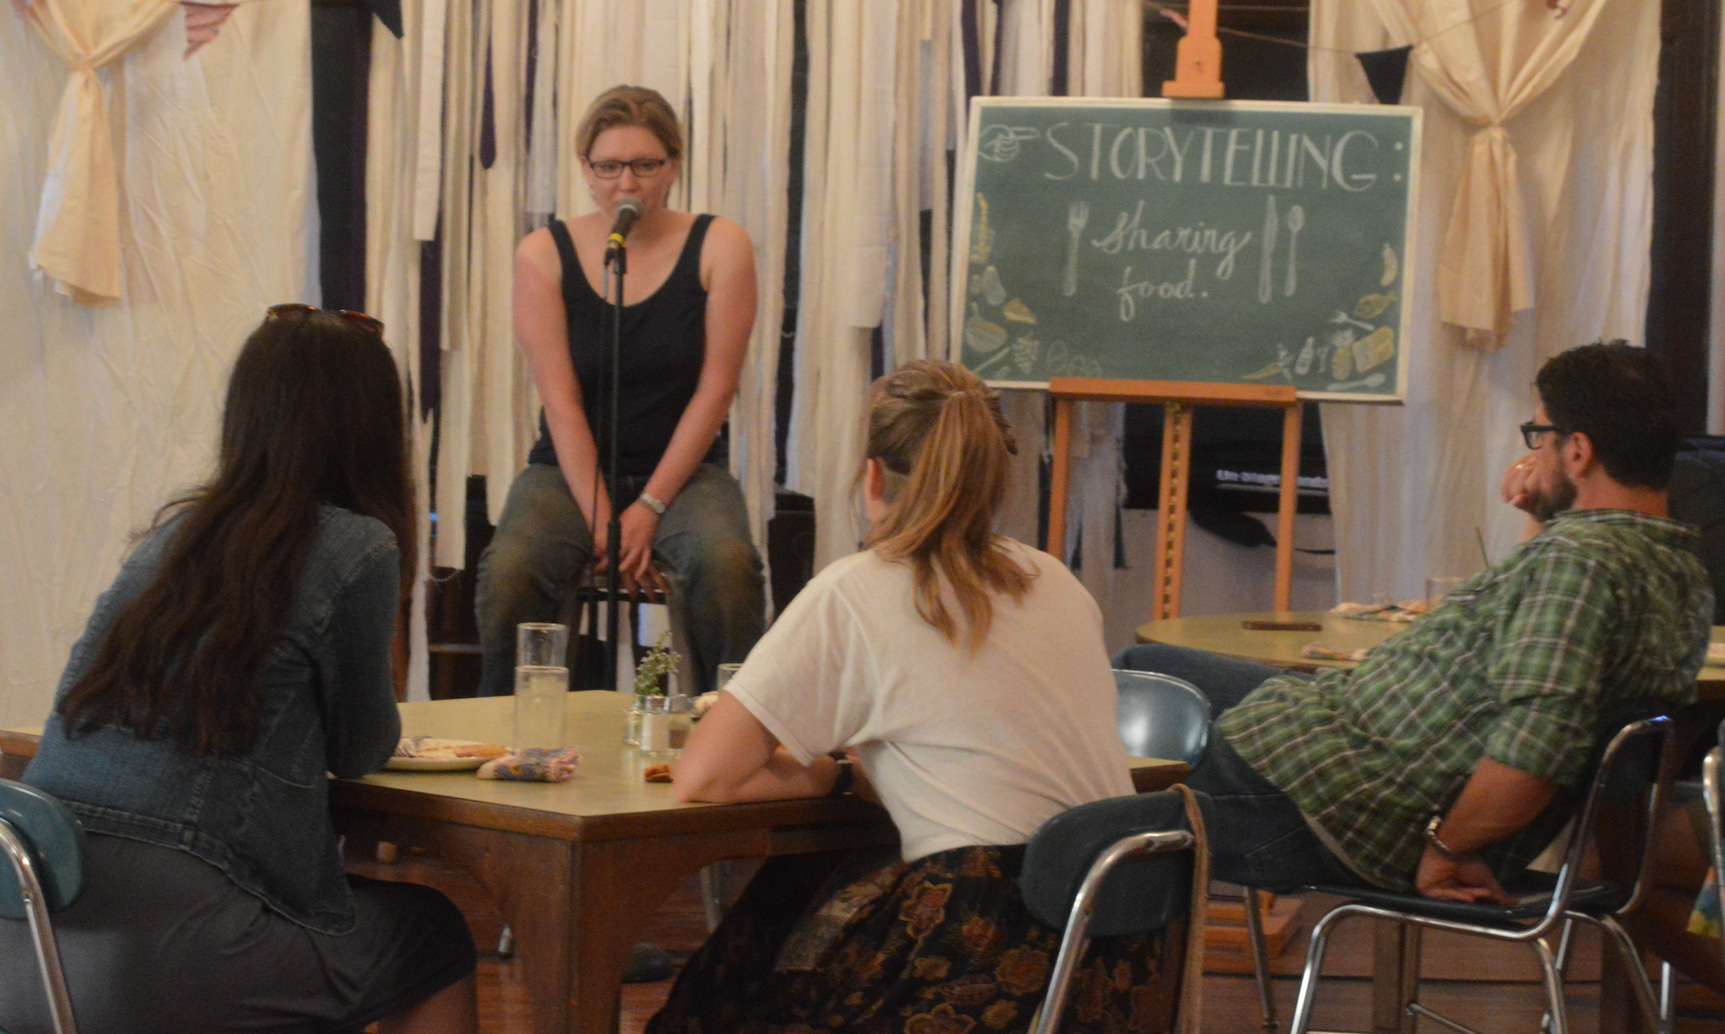 Hussagram: Sharing Food Storytelling